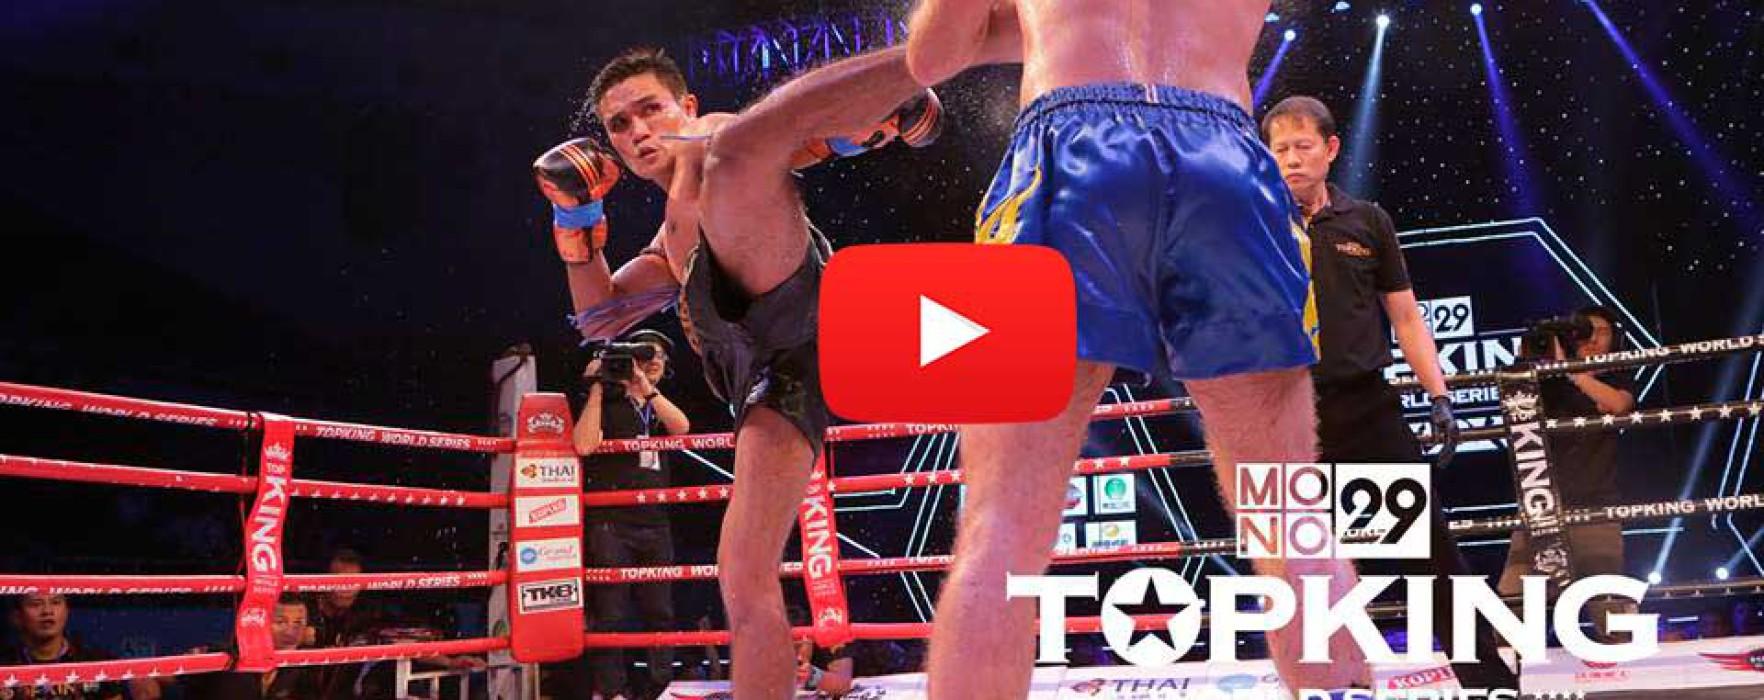 Videos/Results: Kem, Thongchai, Vienot etc at TK7 – 17th October 2015